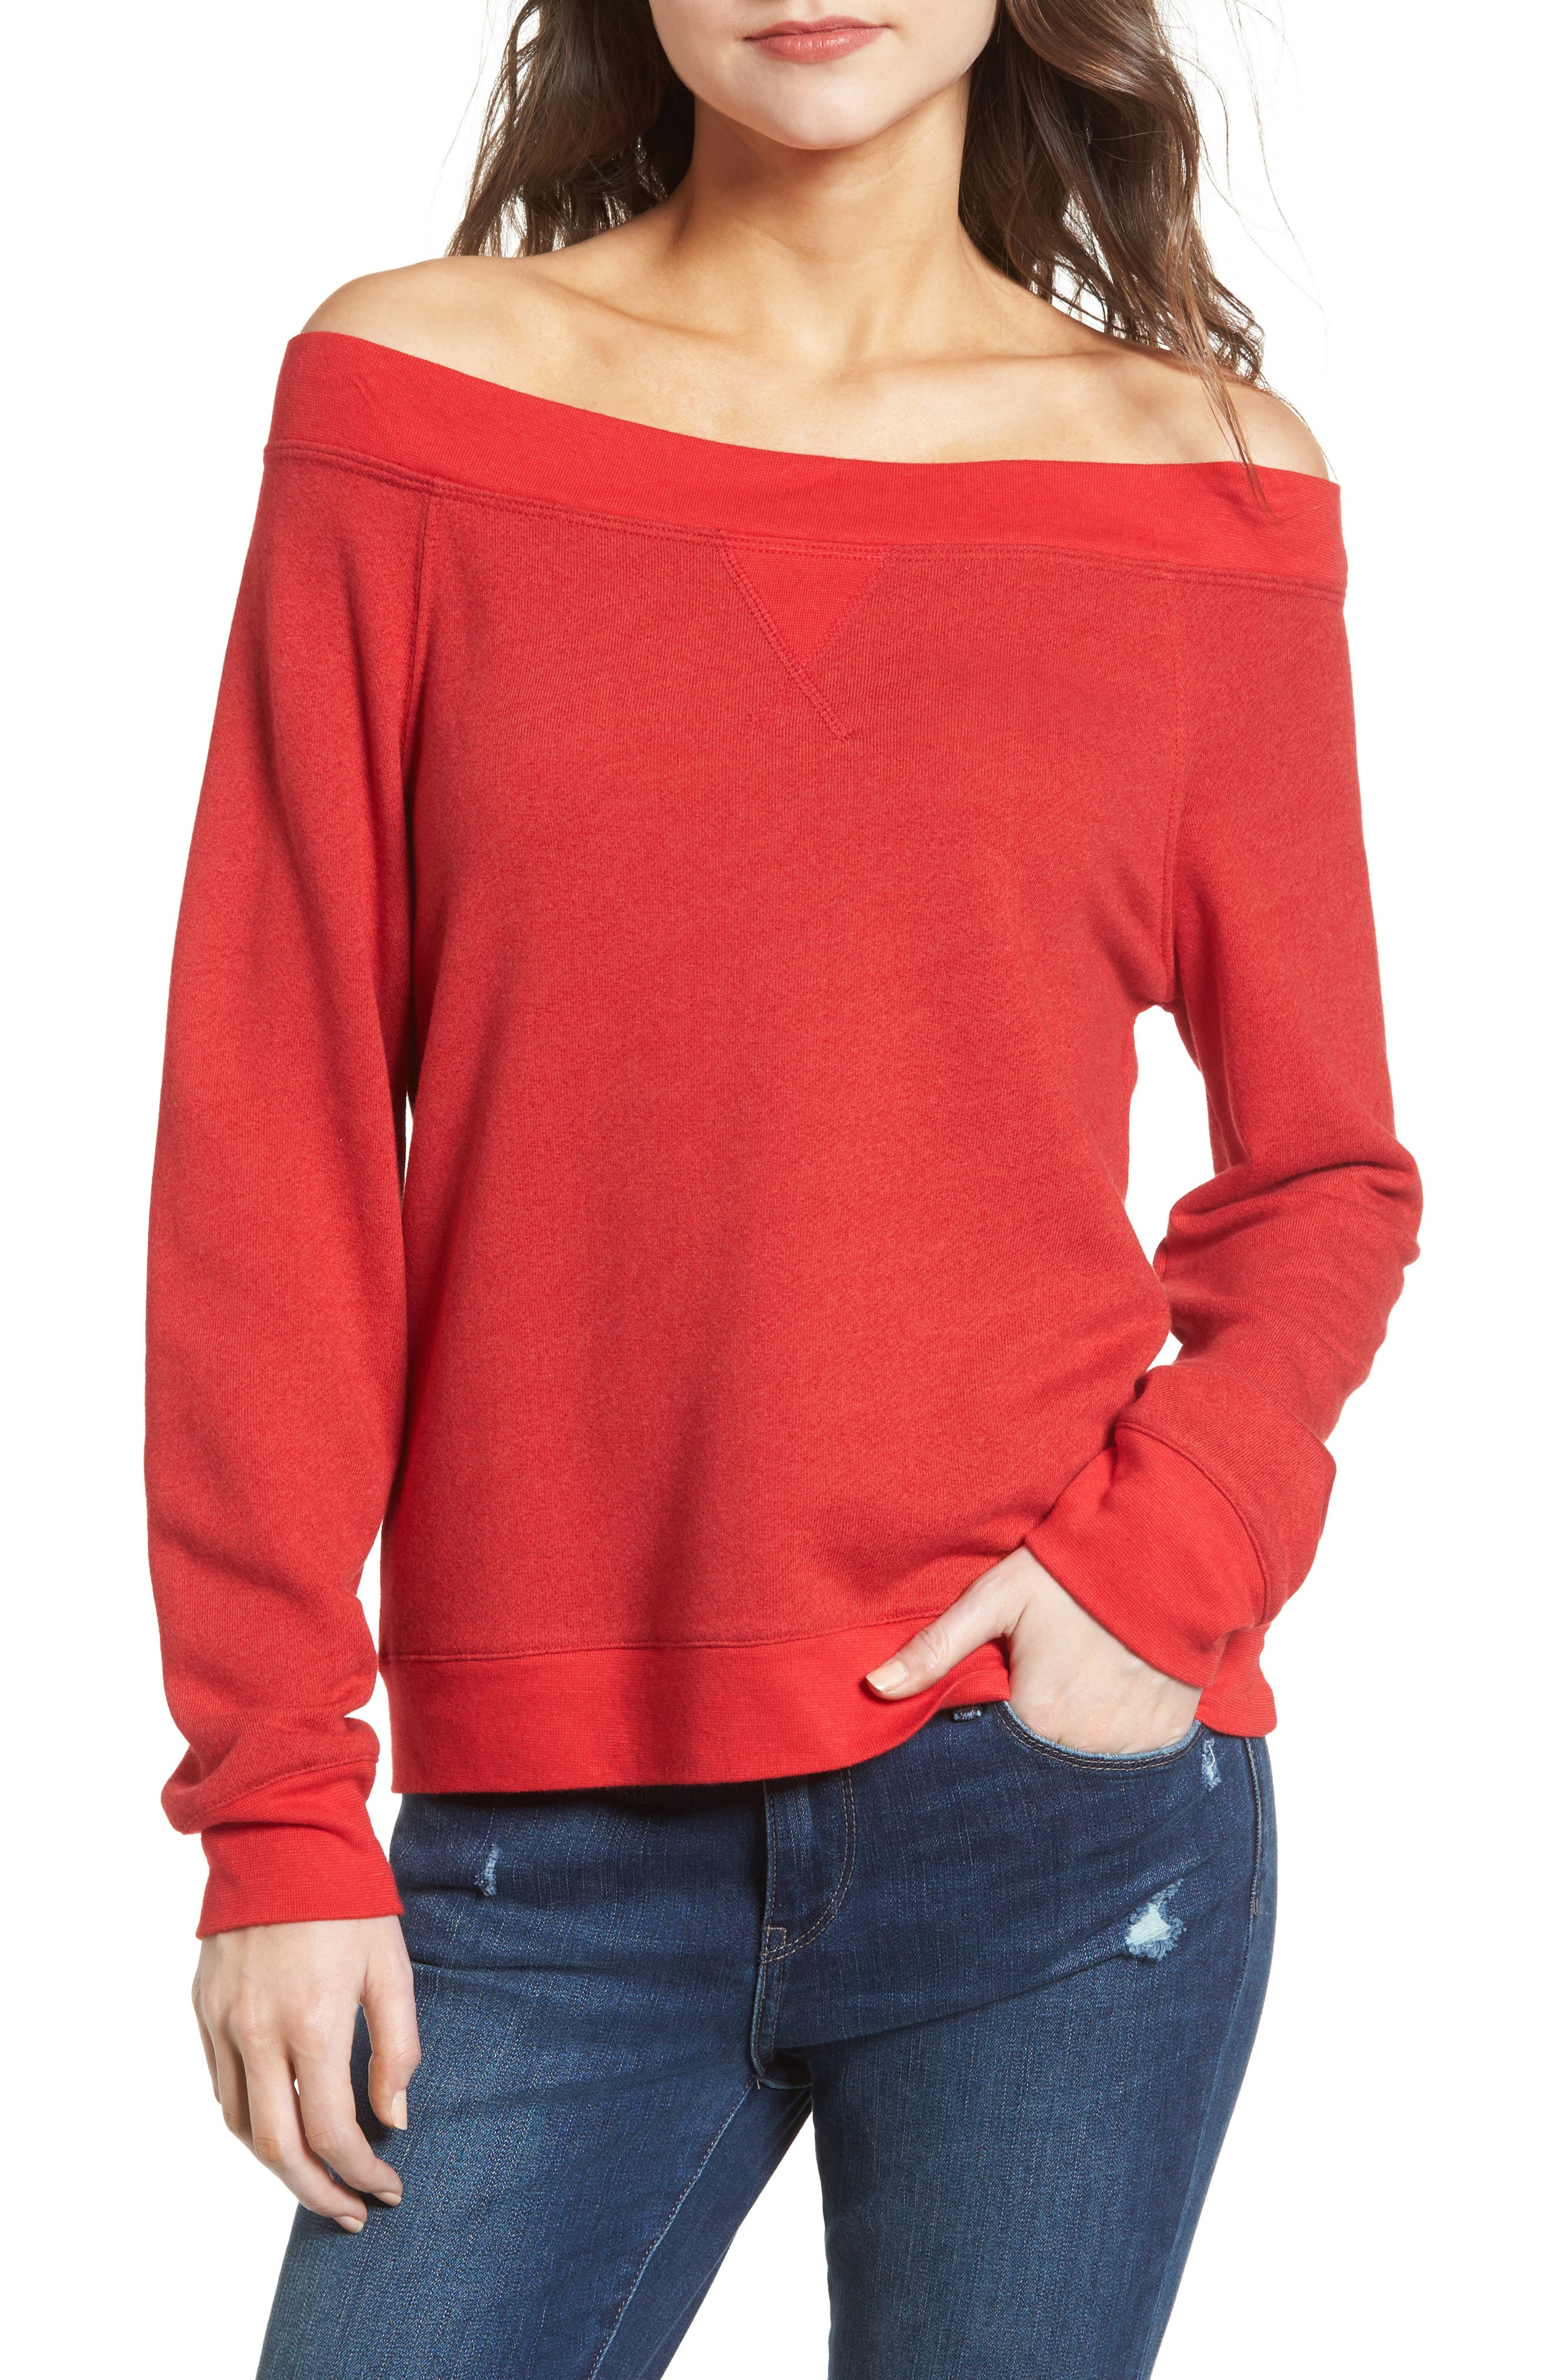 Treasure & Bond Off the Shoulder Sweatshirt